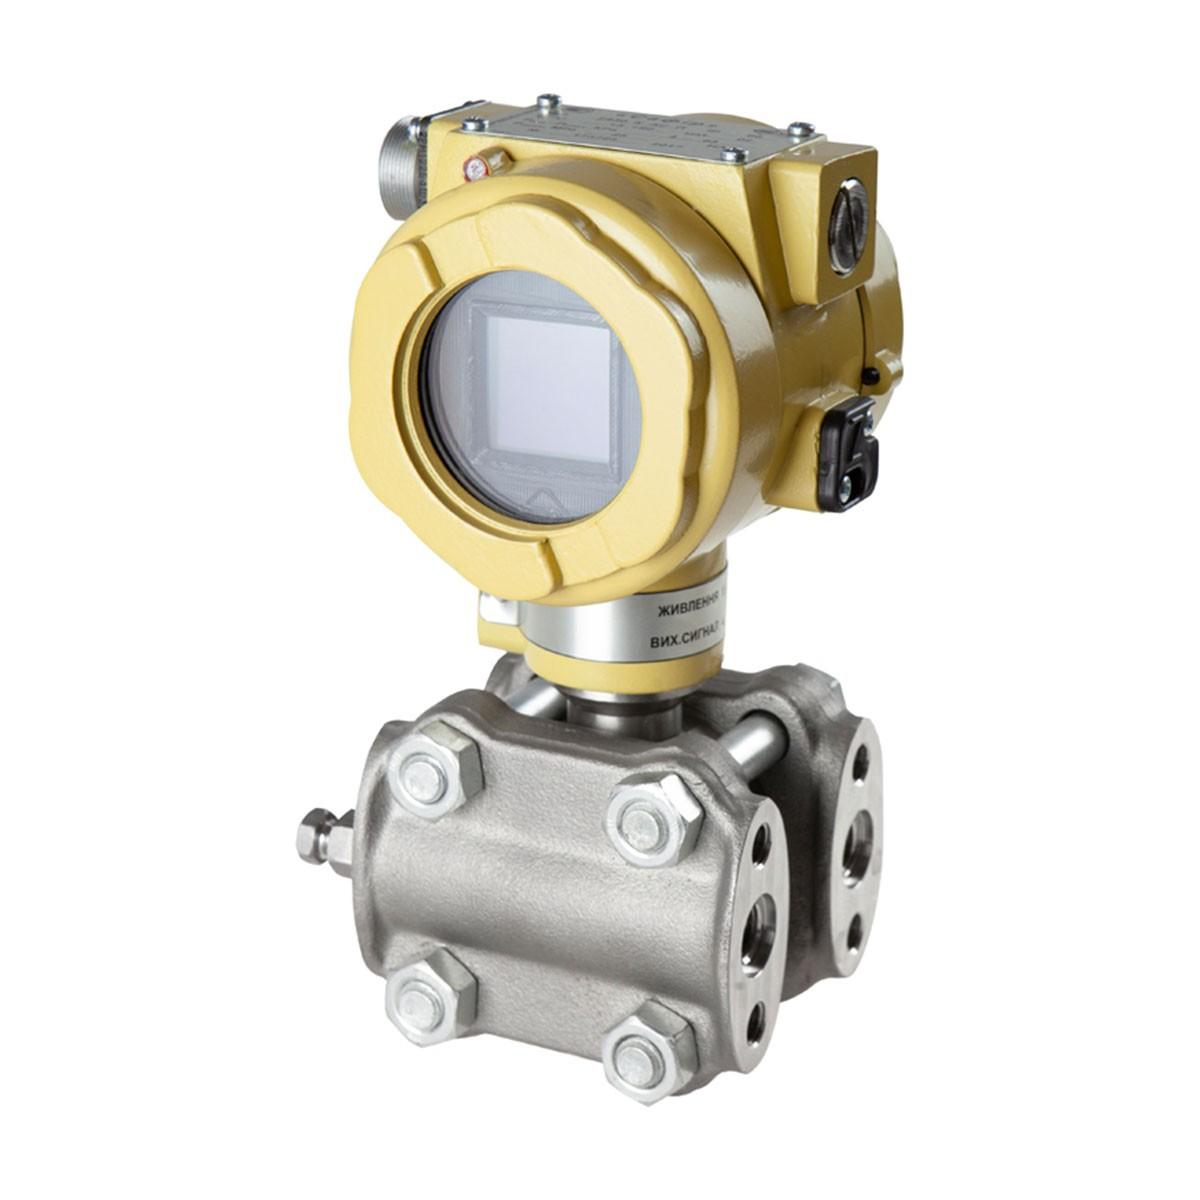 Smart Differential Pressure Transmitters Safir 2420, 2430, 2434, 2440, 2444, 2450, 2454 K